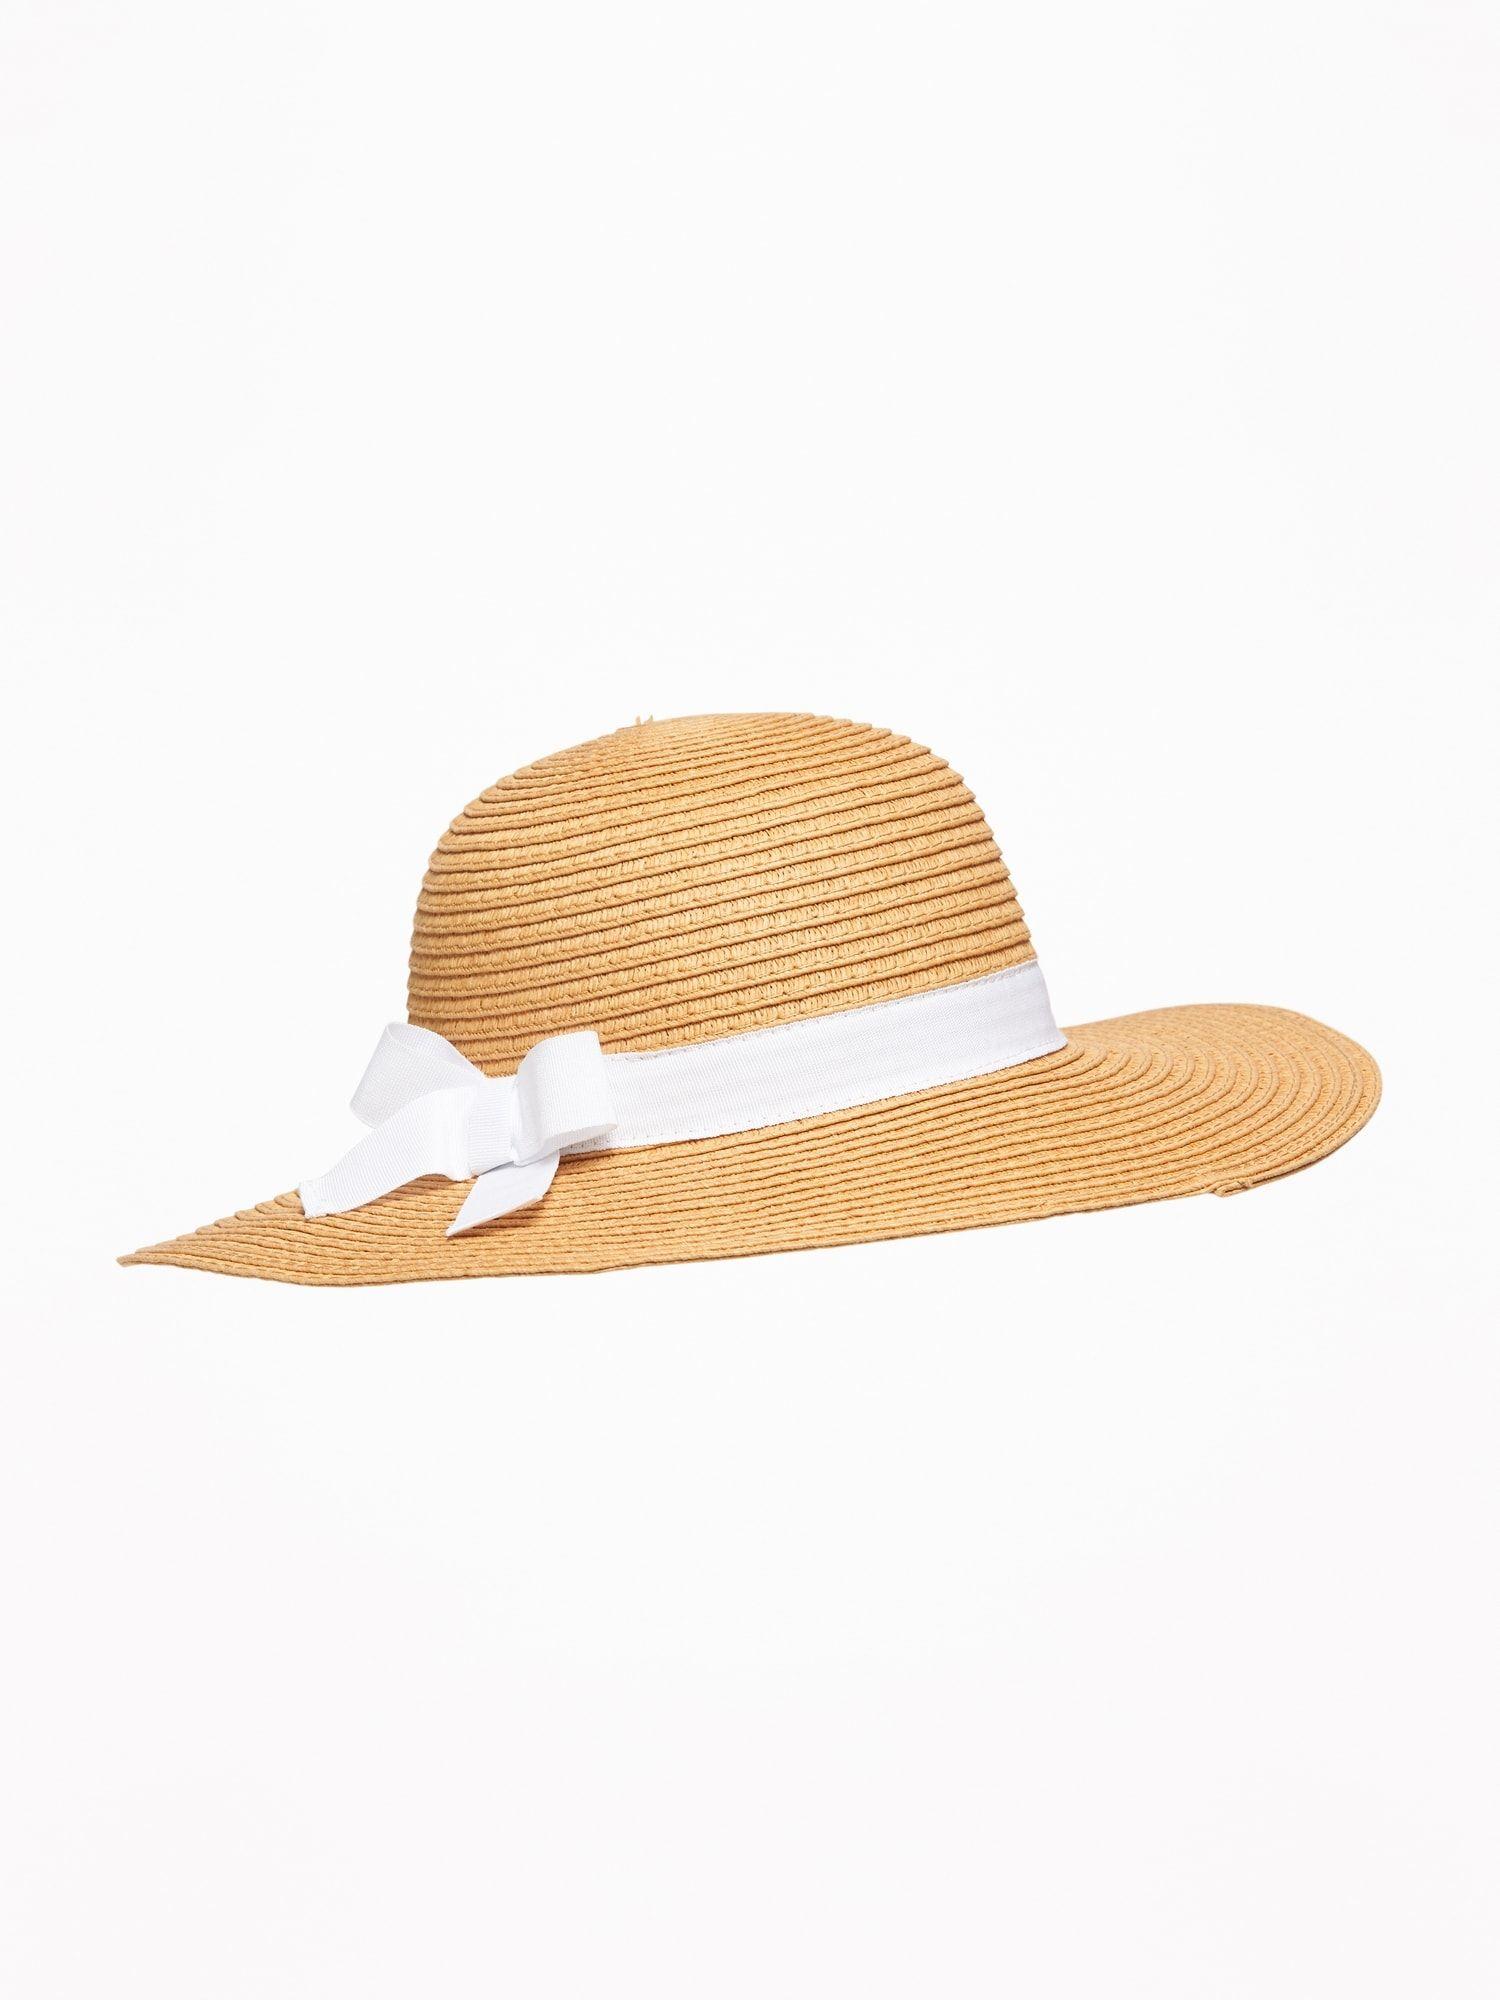 Straw Sun Hat For Baby Old Navy Baby Sun Hat Straw Sun Hat Toddler Sun Hat